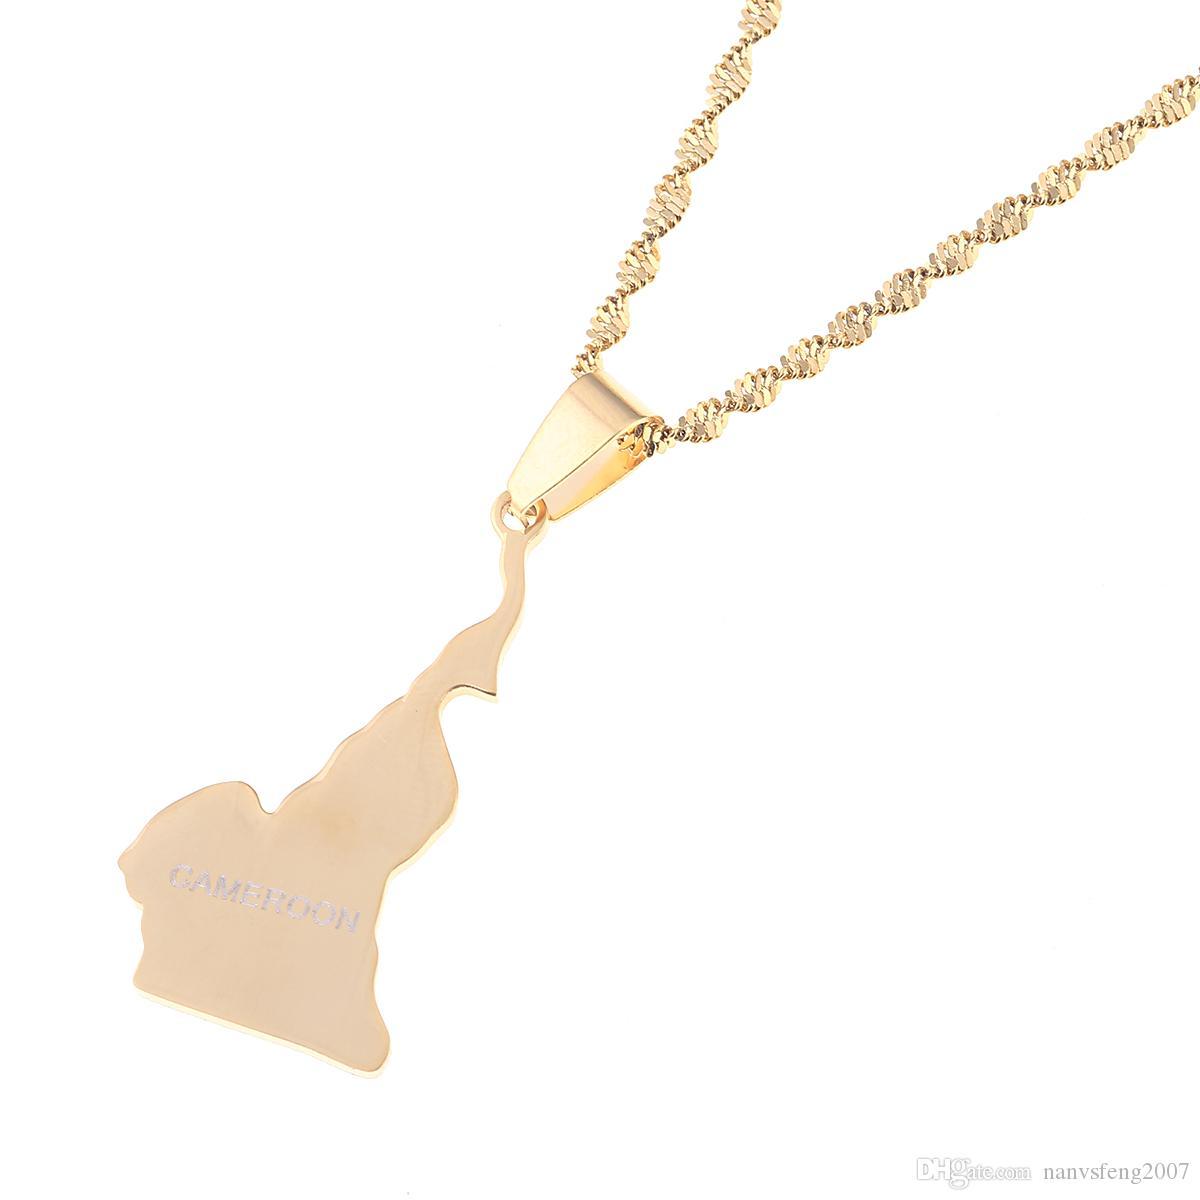 Stainless Steel R/épublique du Cameroun Map Pendant Necklace Douala Yaounde Cameroon Map Chain Jewelry